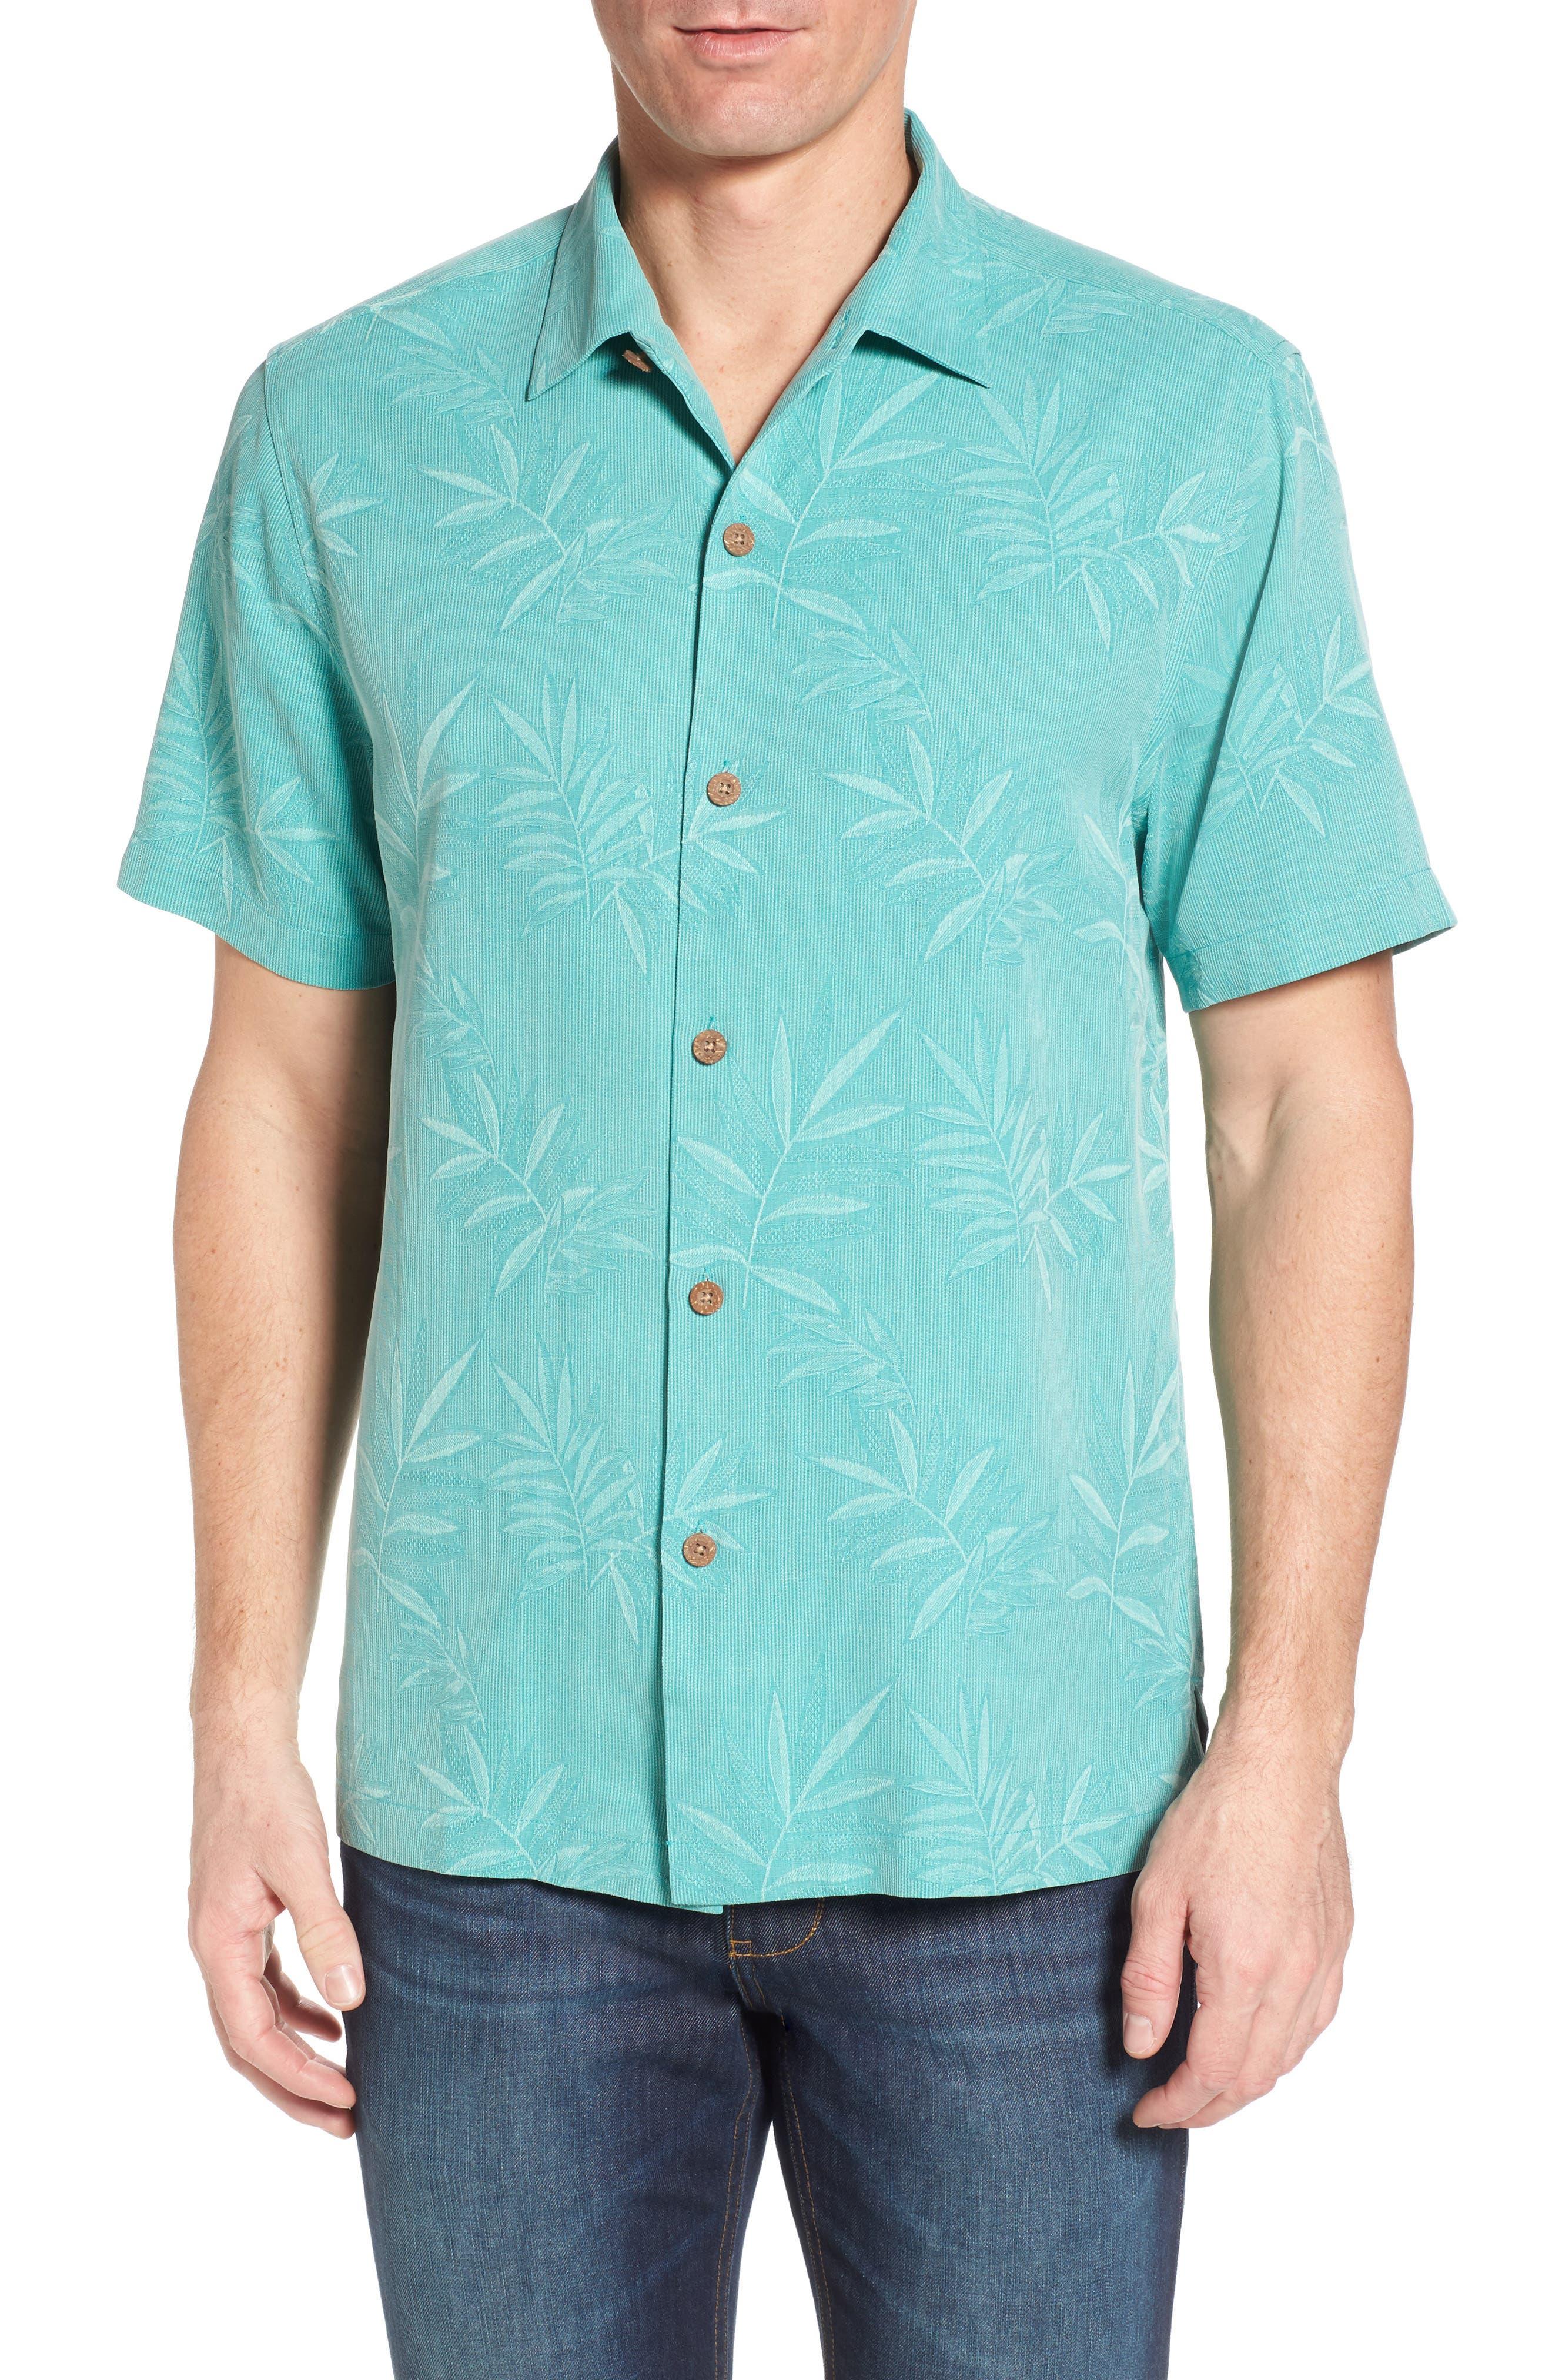 Alternate Image 1 Selected - Tommy Bahama Luau Floral Silk Shirt